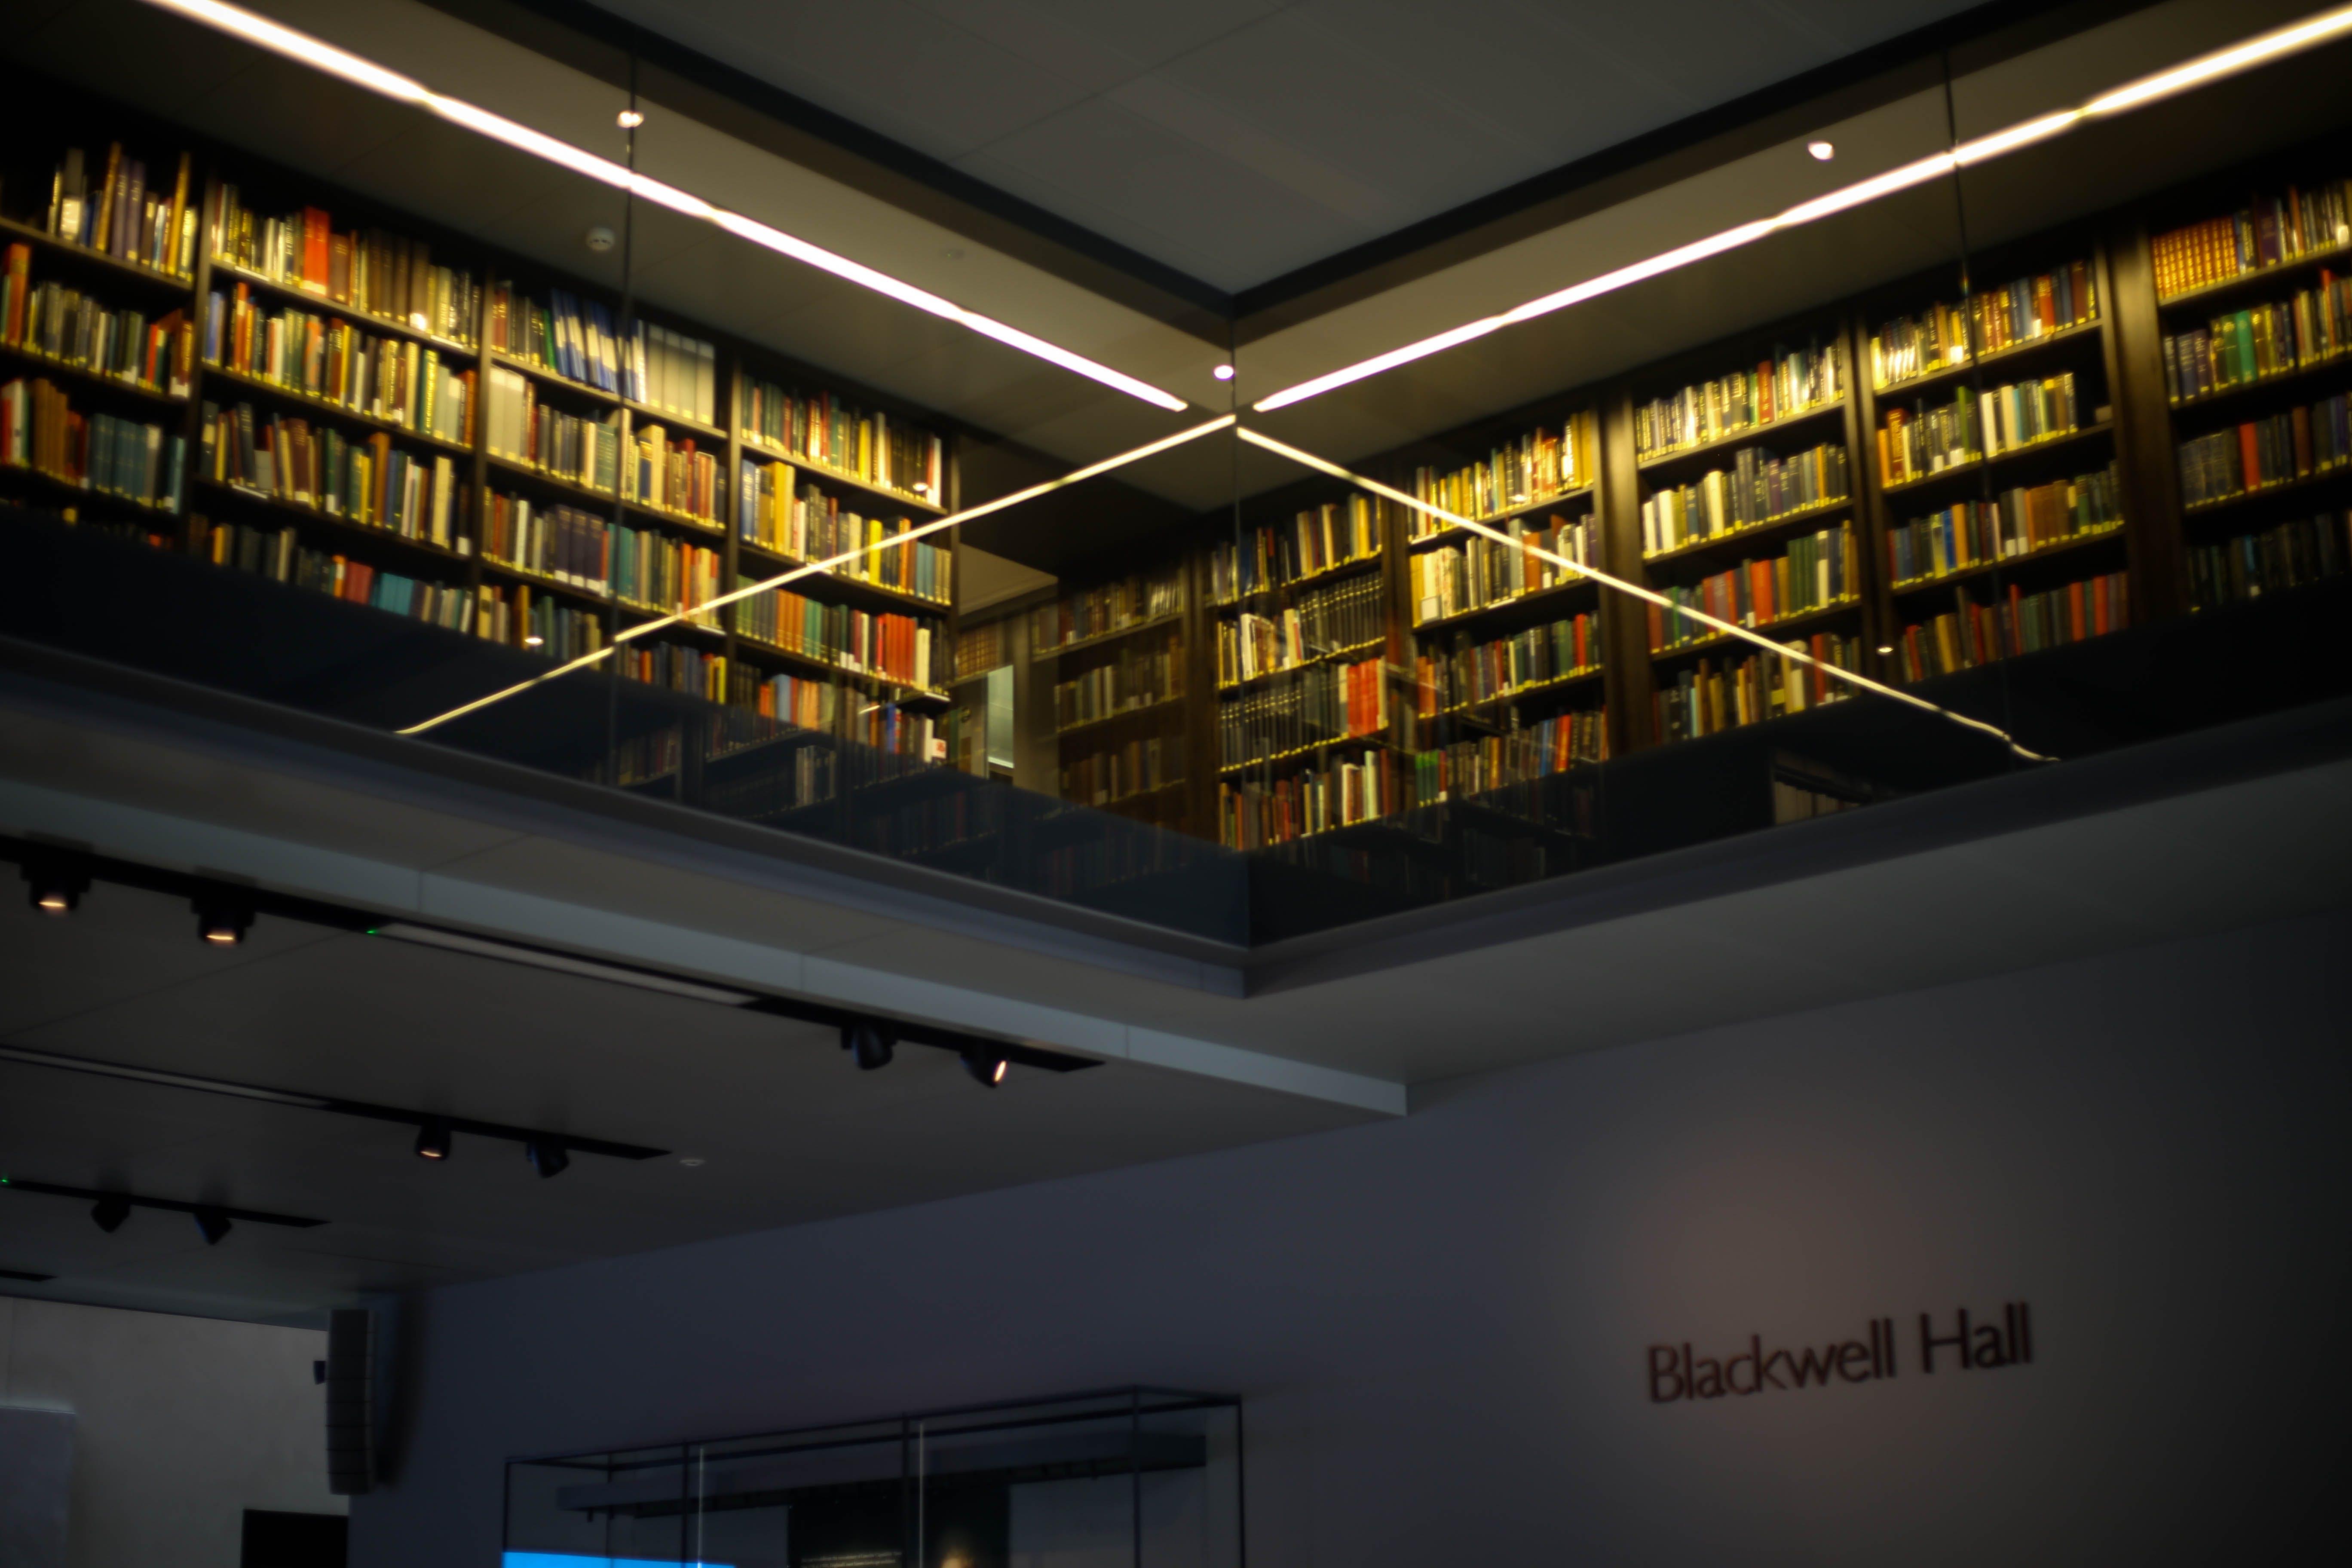 Blackwell Hall Interior